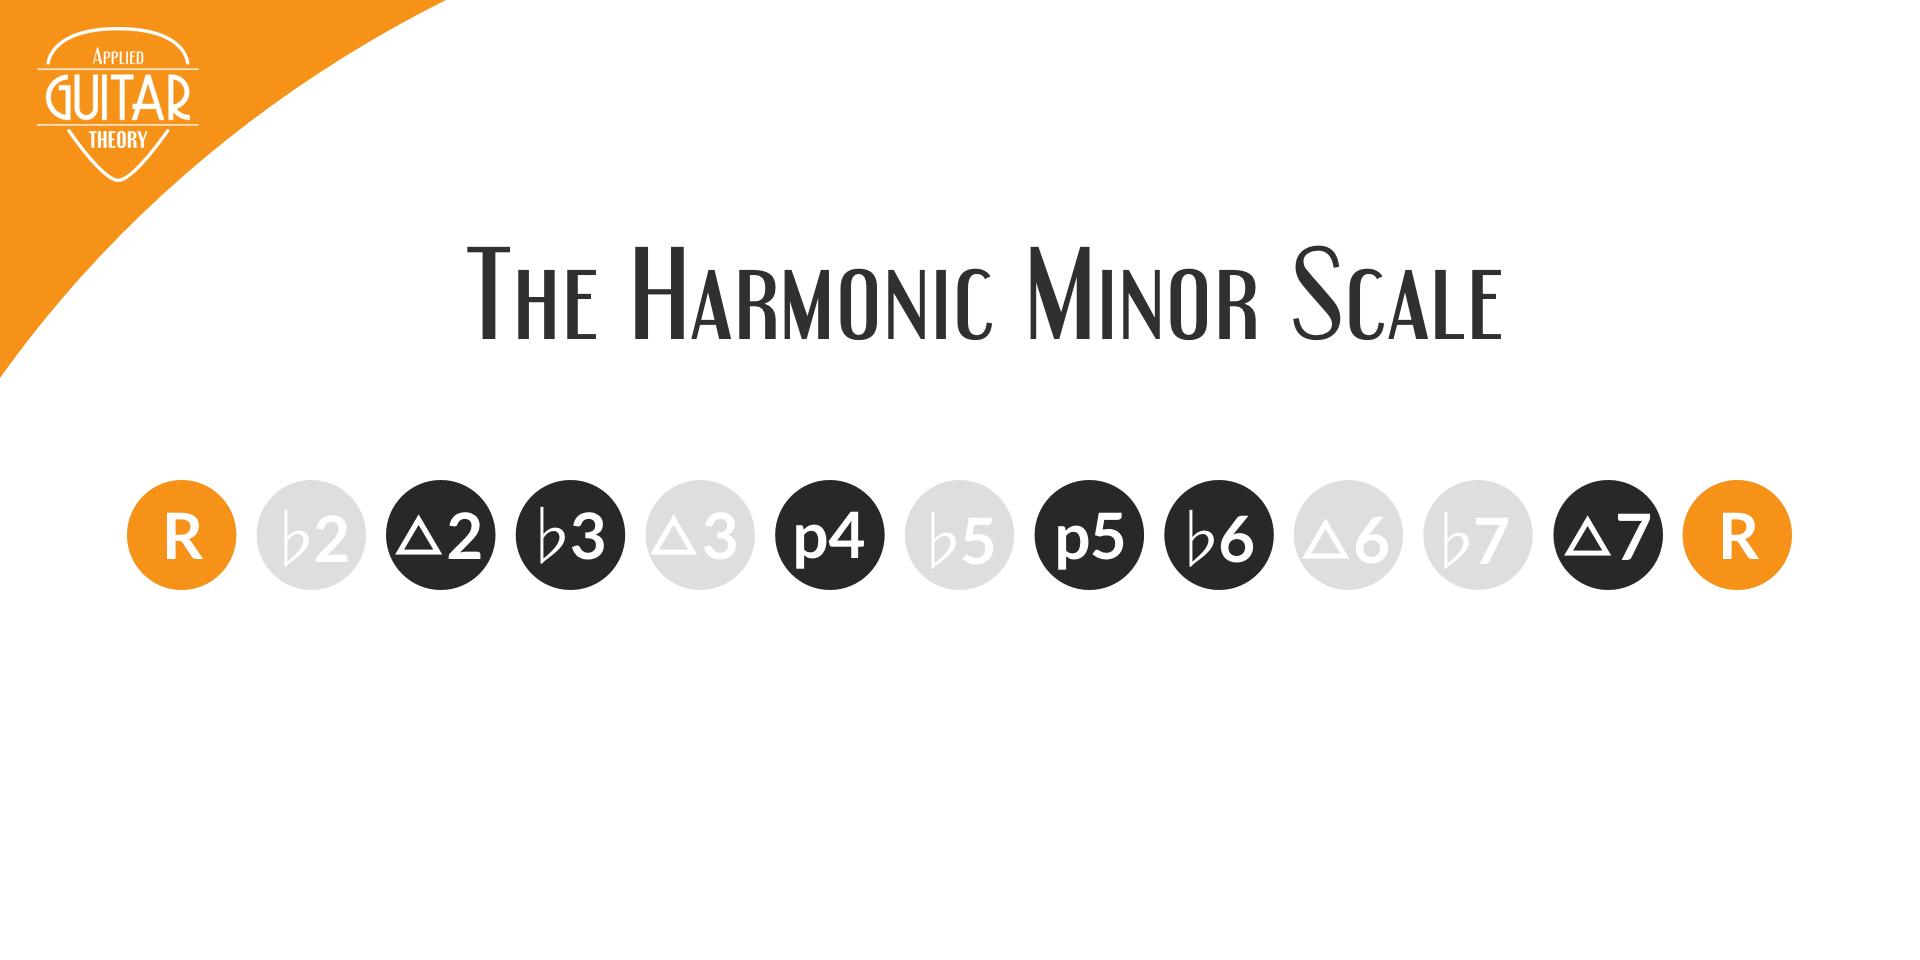 Harmonic minor scale featured image